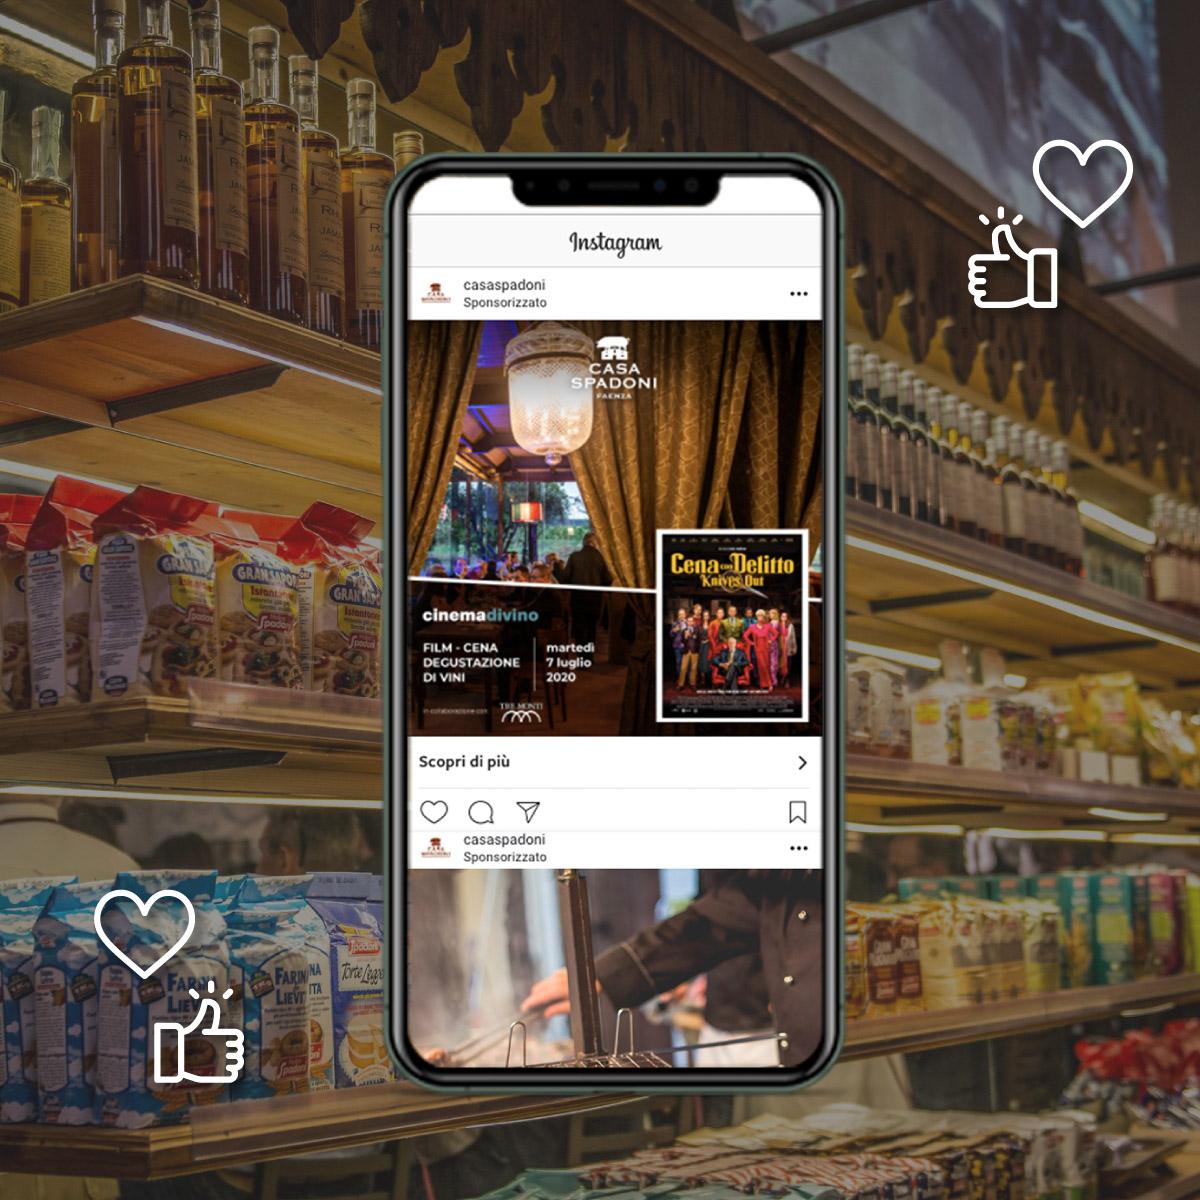 ristoranti-casa-spadoni-food-marketing-digital-advertising-1